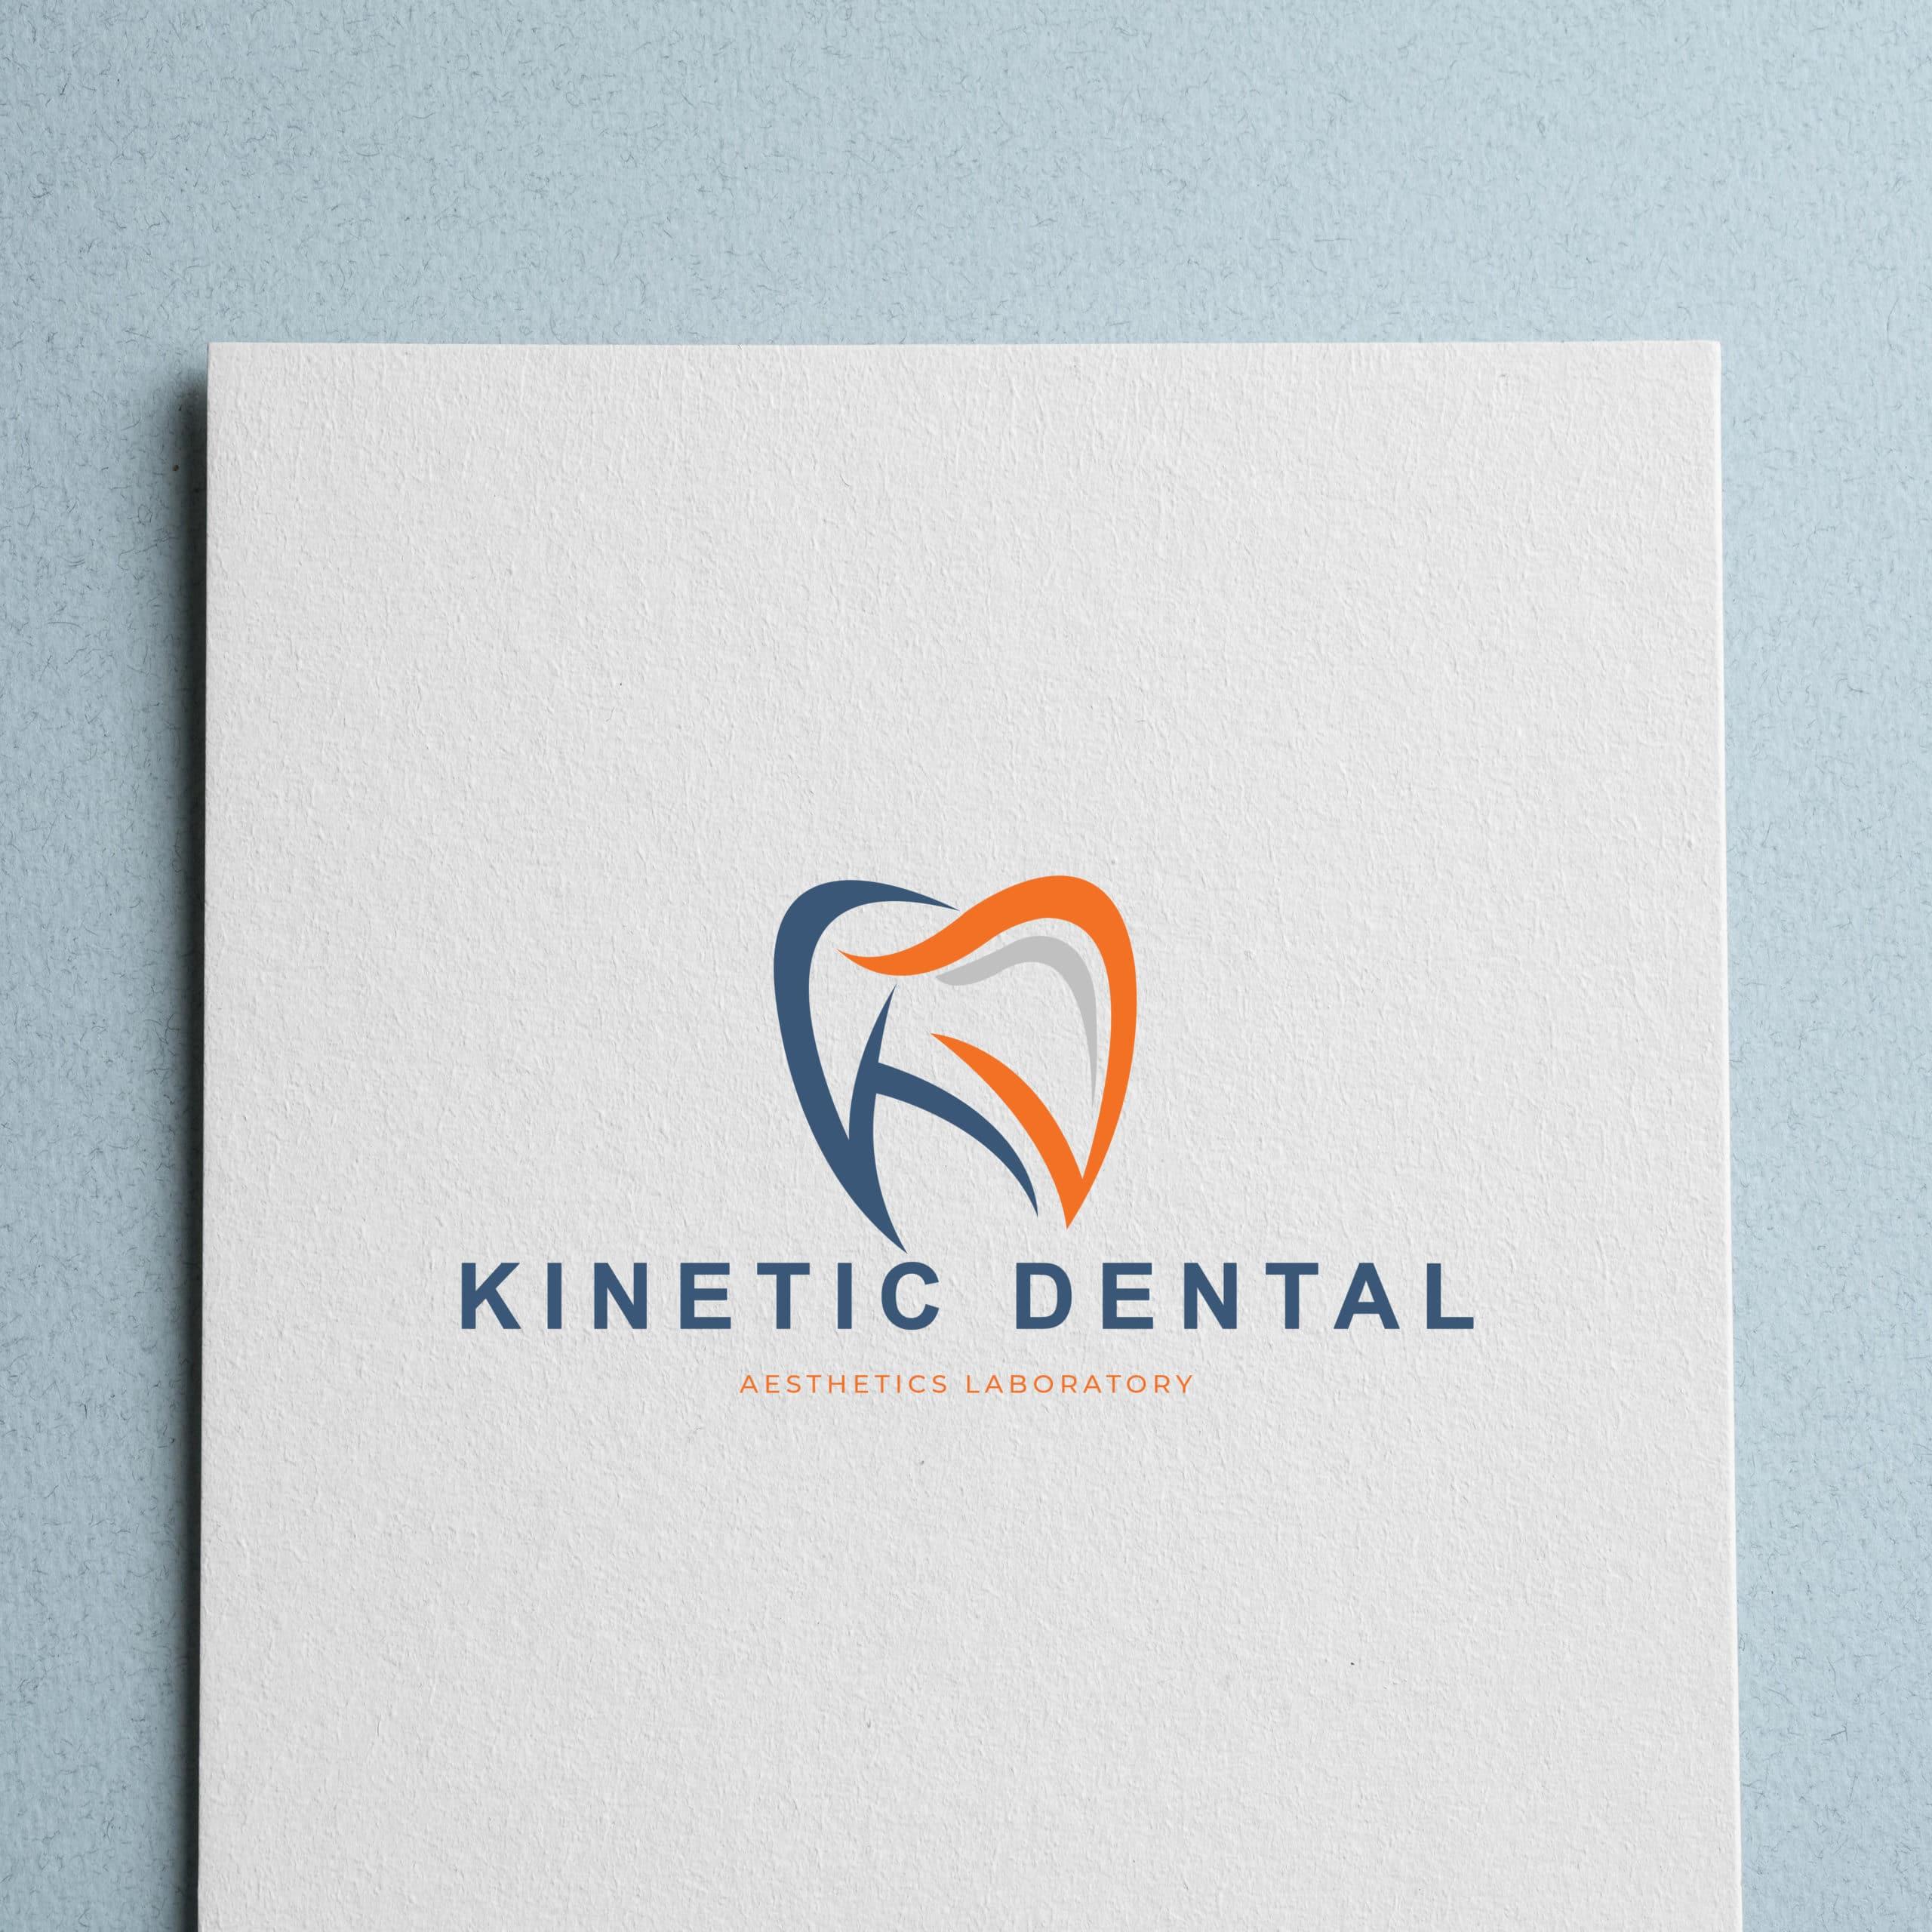 Kinetic Dental Aesthetics Lab, Vancouver